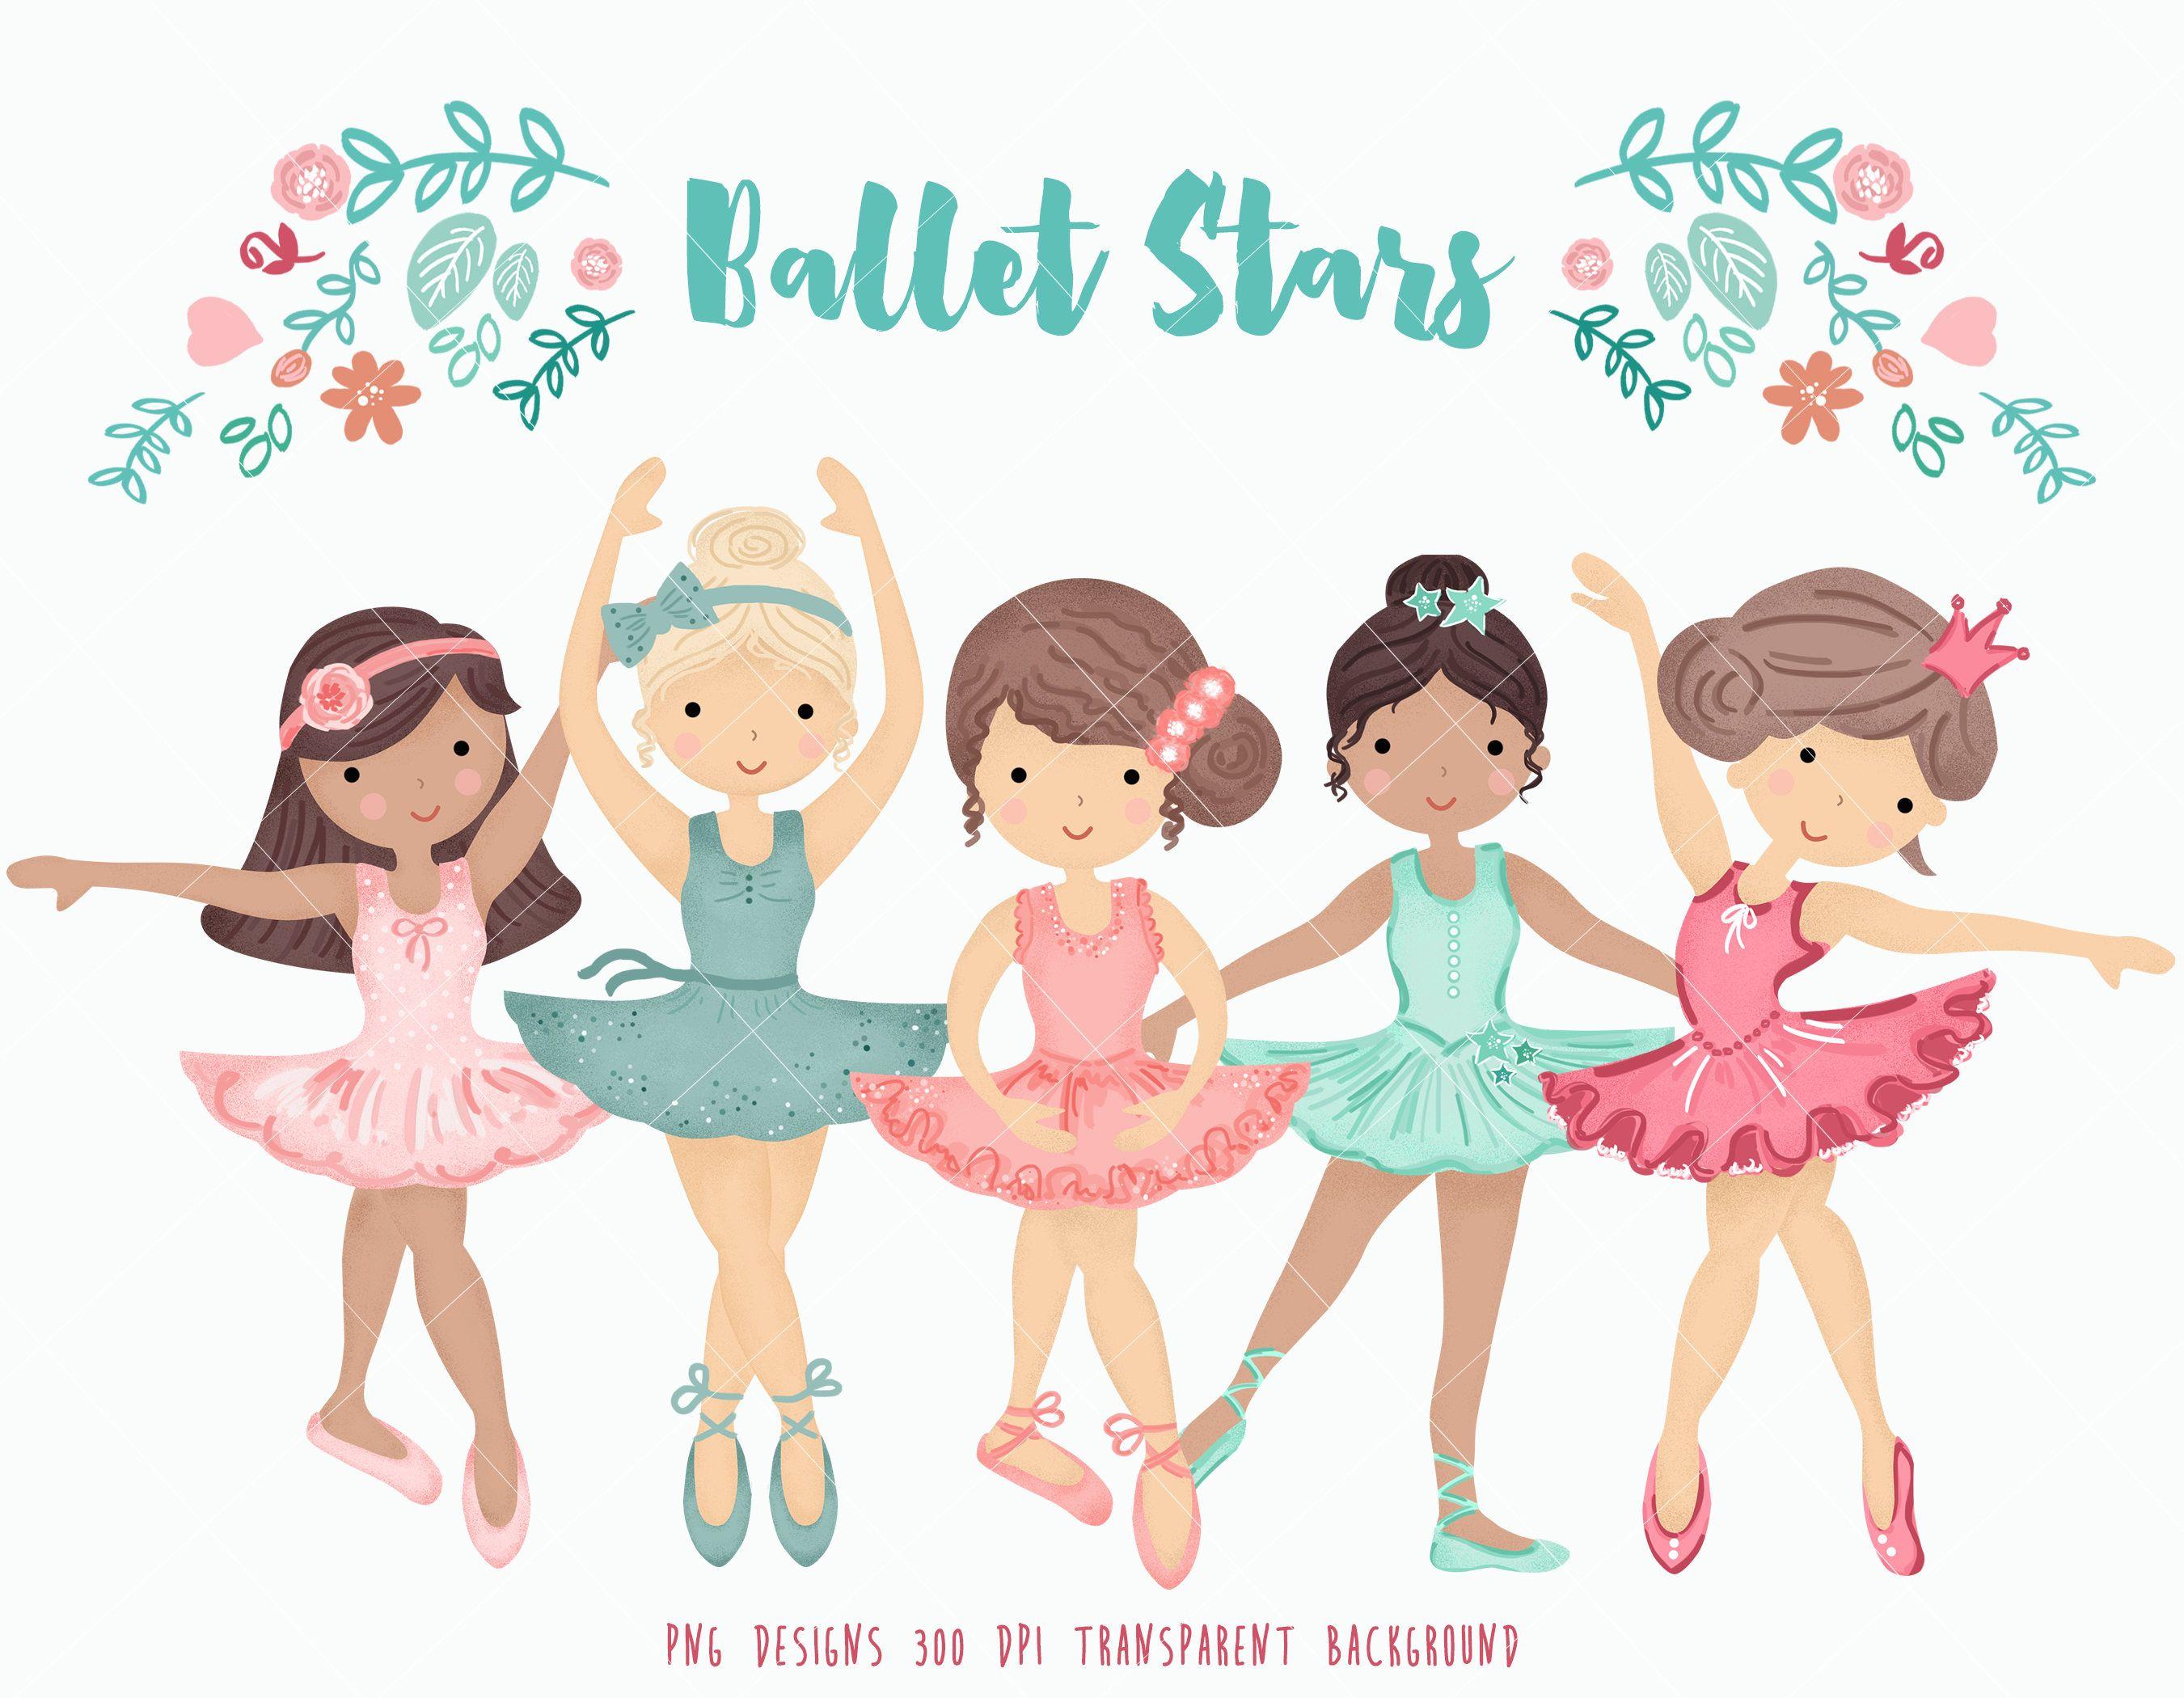 medium resolution of ballerina clipart little ballerinas clip art ballet graphic dancing girl ballet illustration prima ballerina dancer hand drawn art